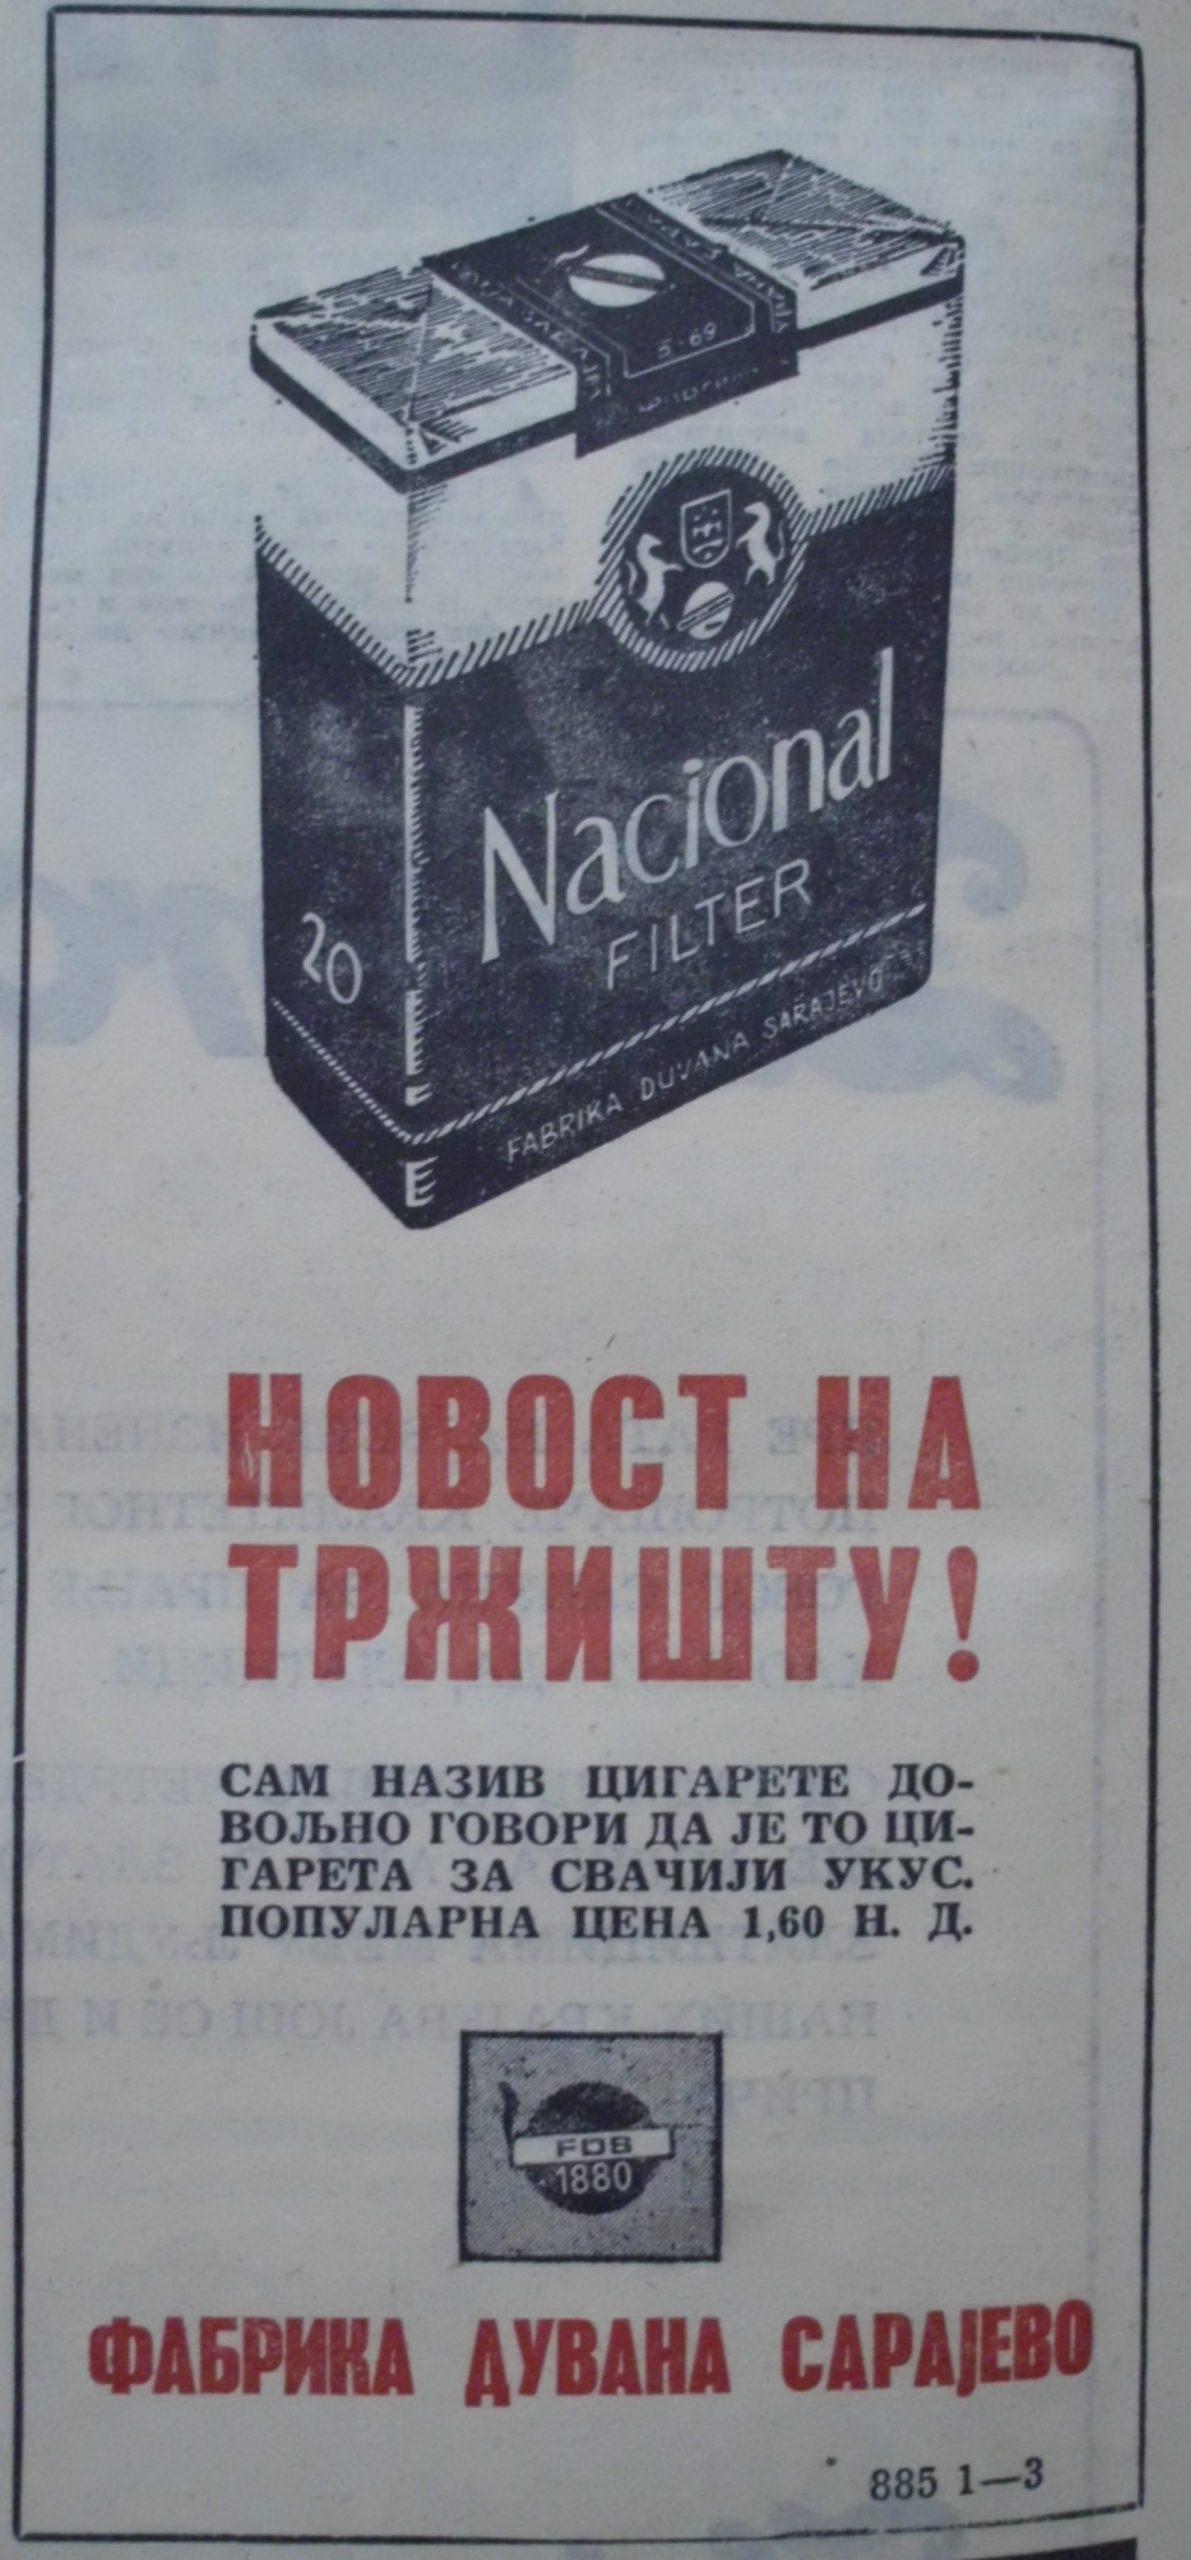 Cigare Nacional